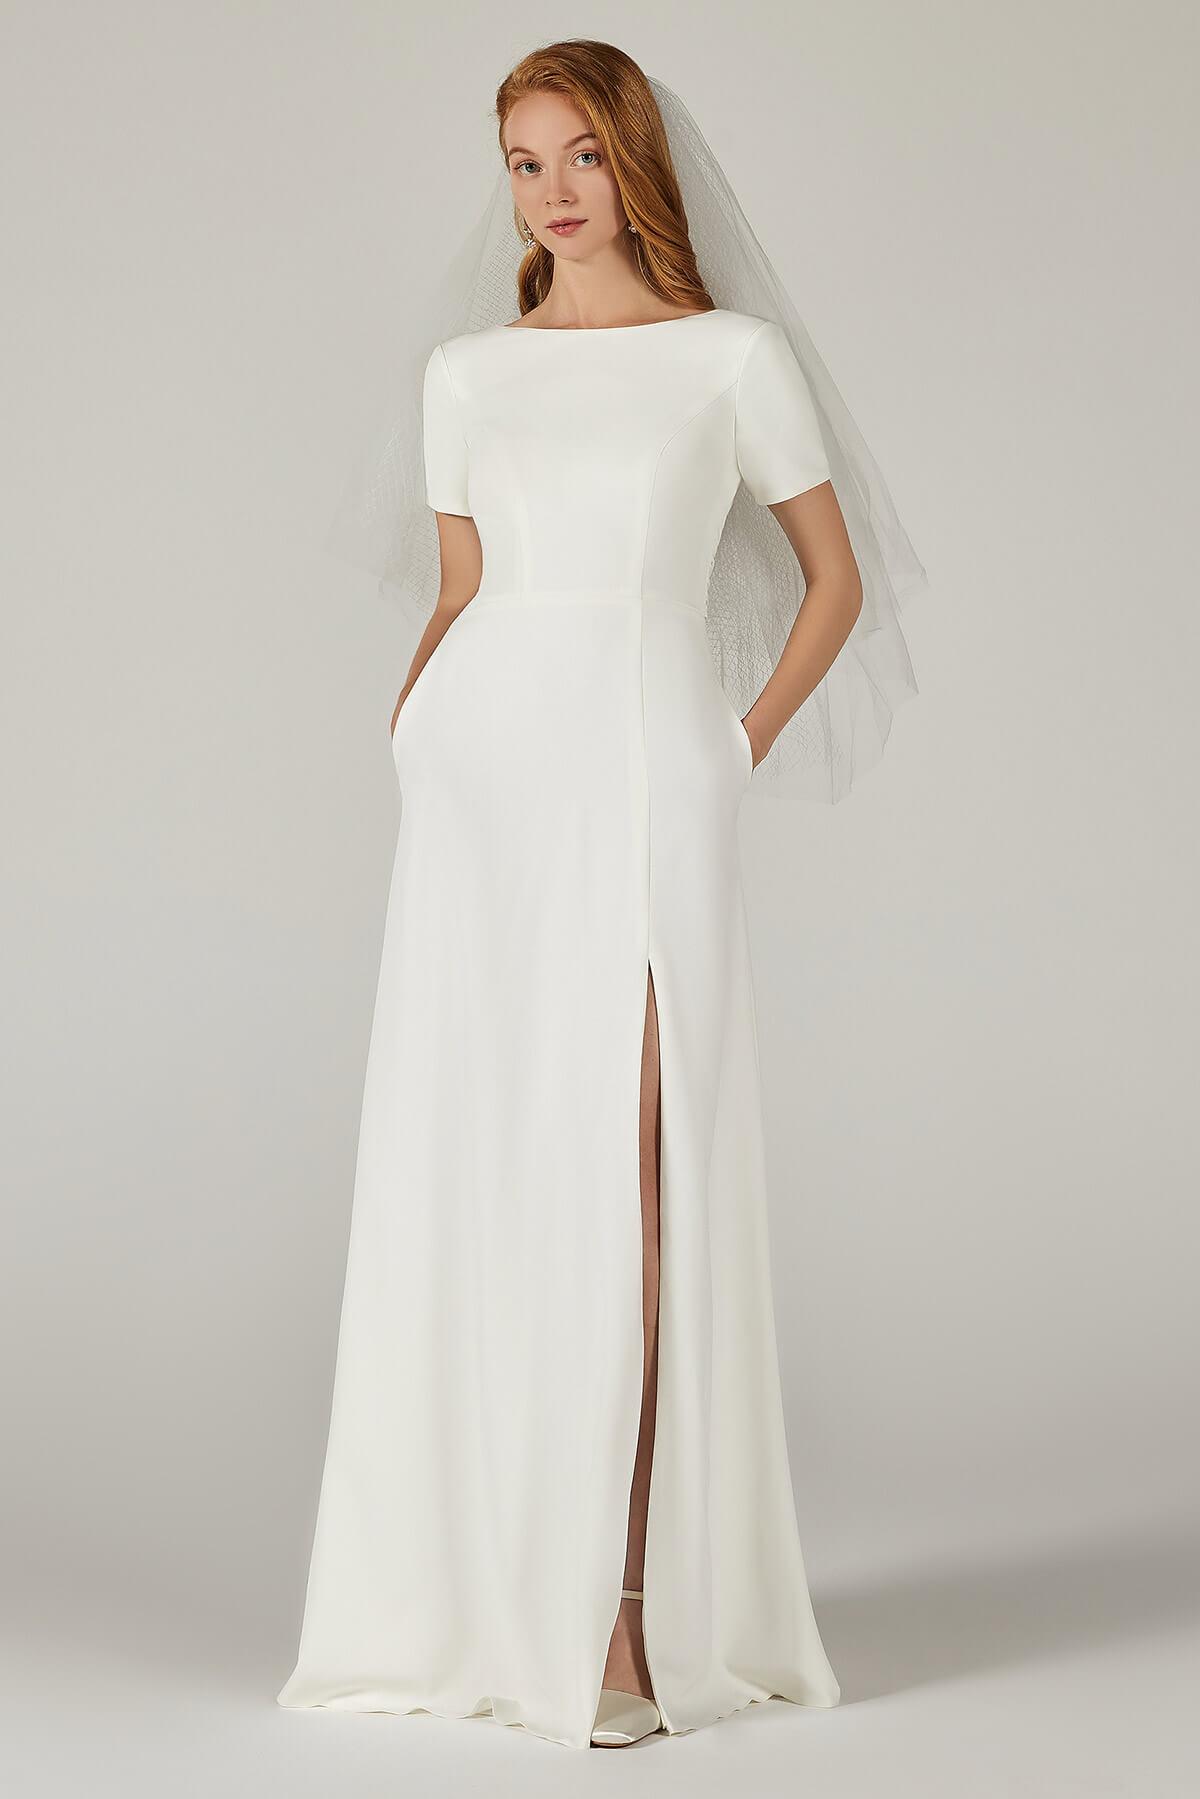 Cocomelody Black Wedding Dress List - CW2214